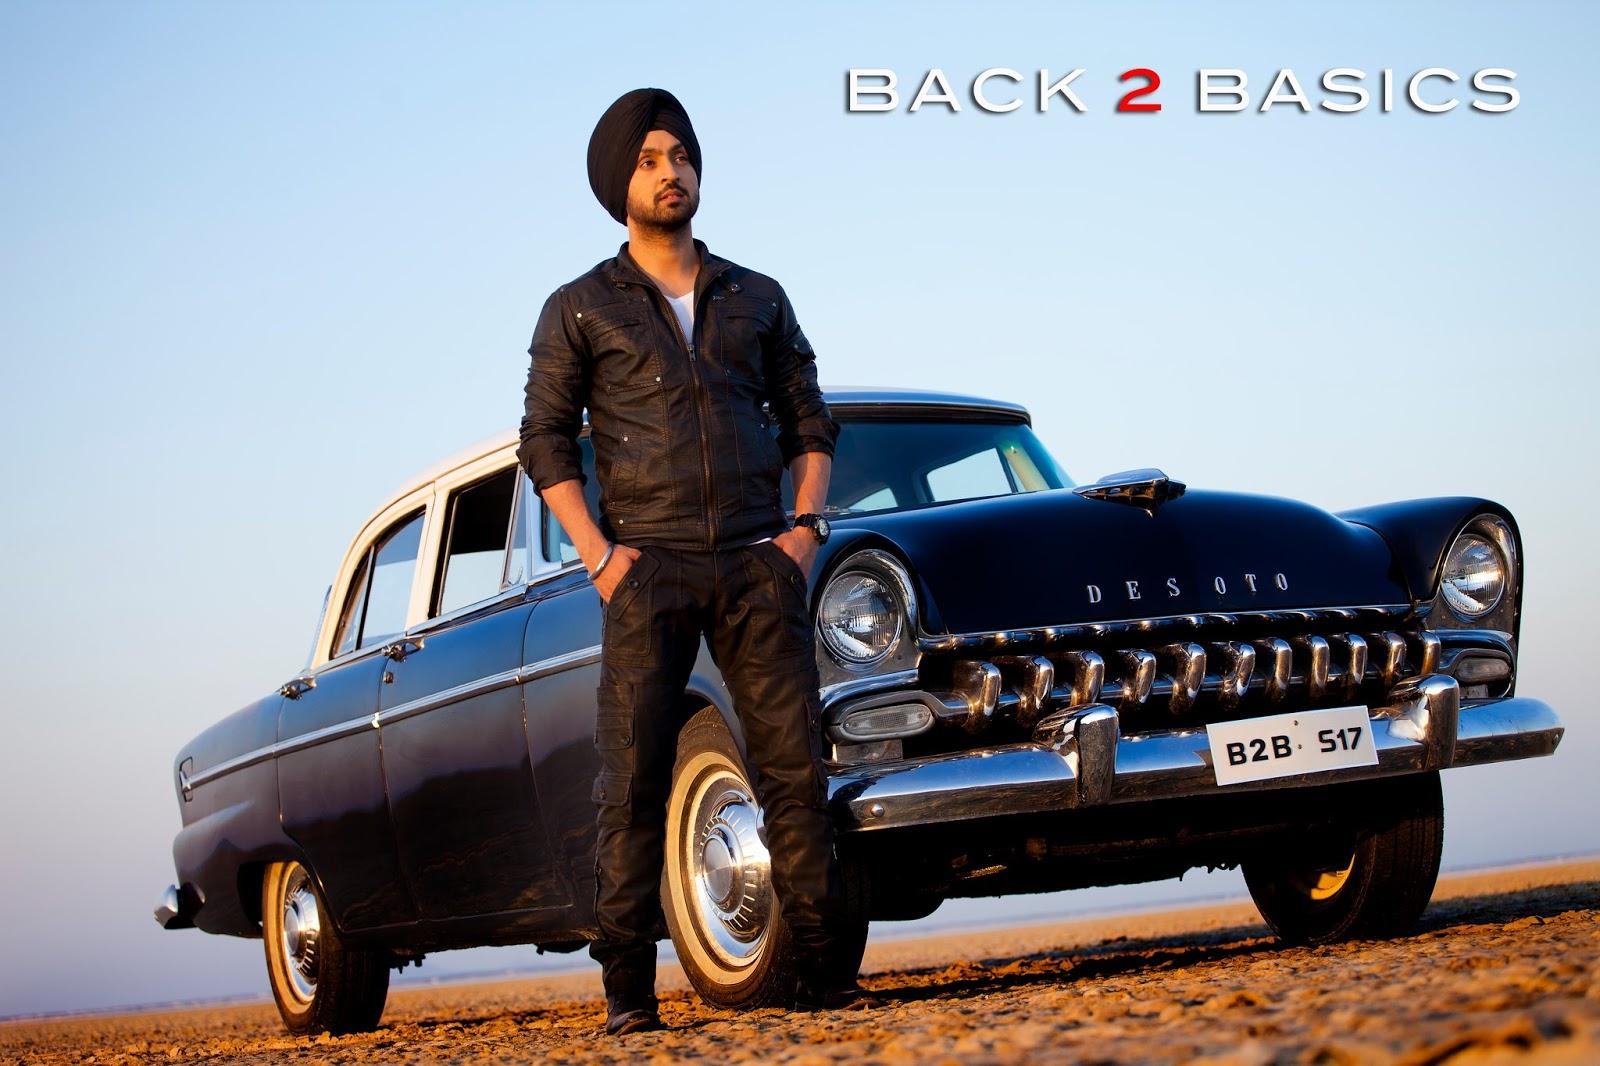 Back to Basics - Diljit Dosanjh Upcoming Album In 2012Diljit Back To Basics